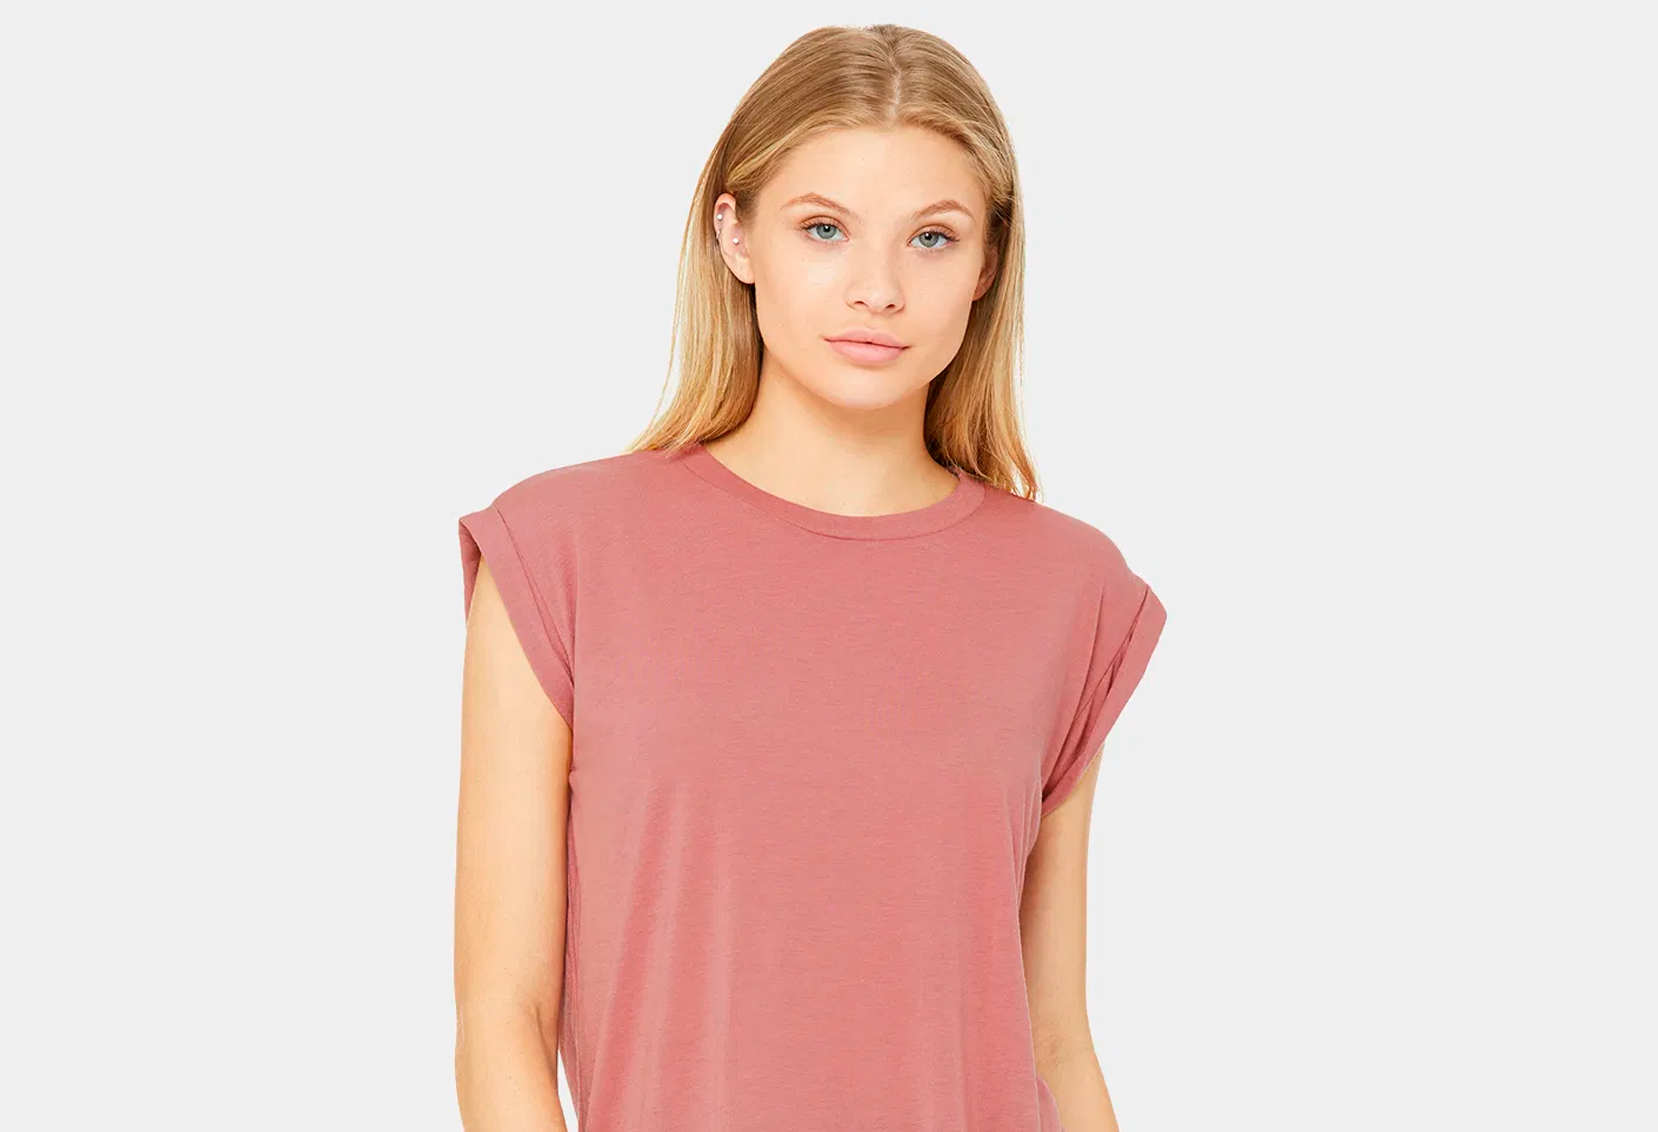 Muscle Tee – T-shirt do momento